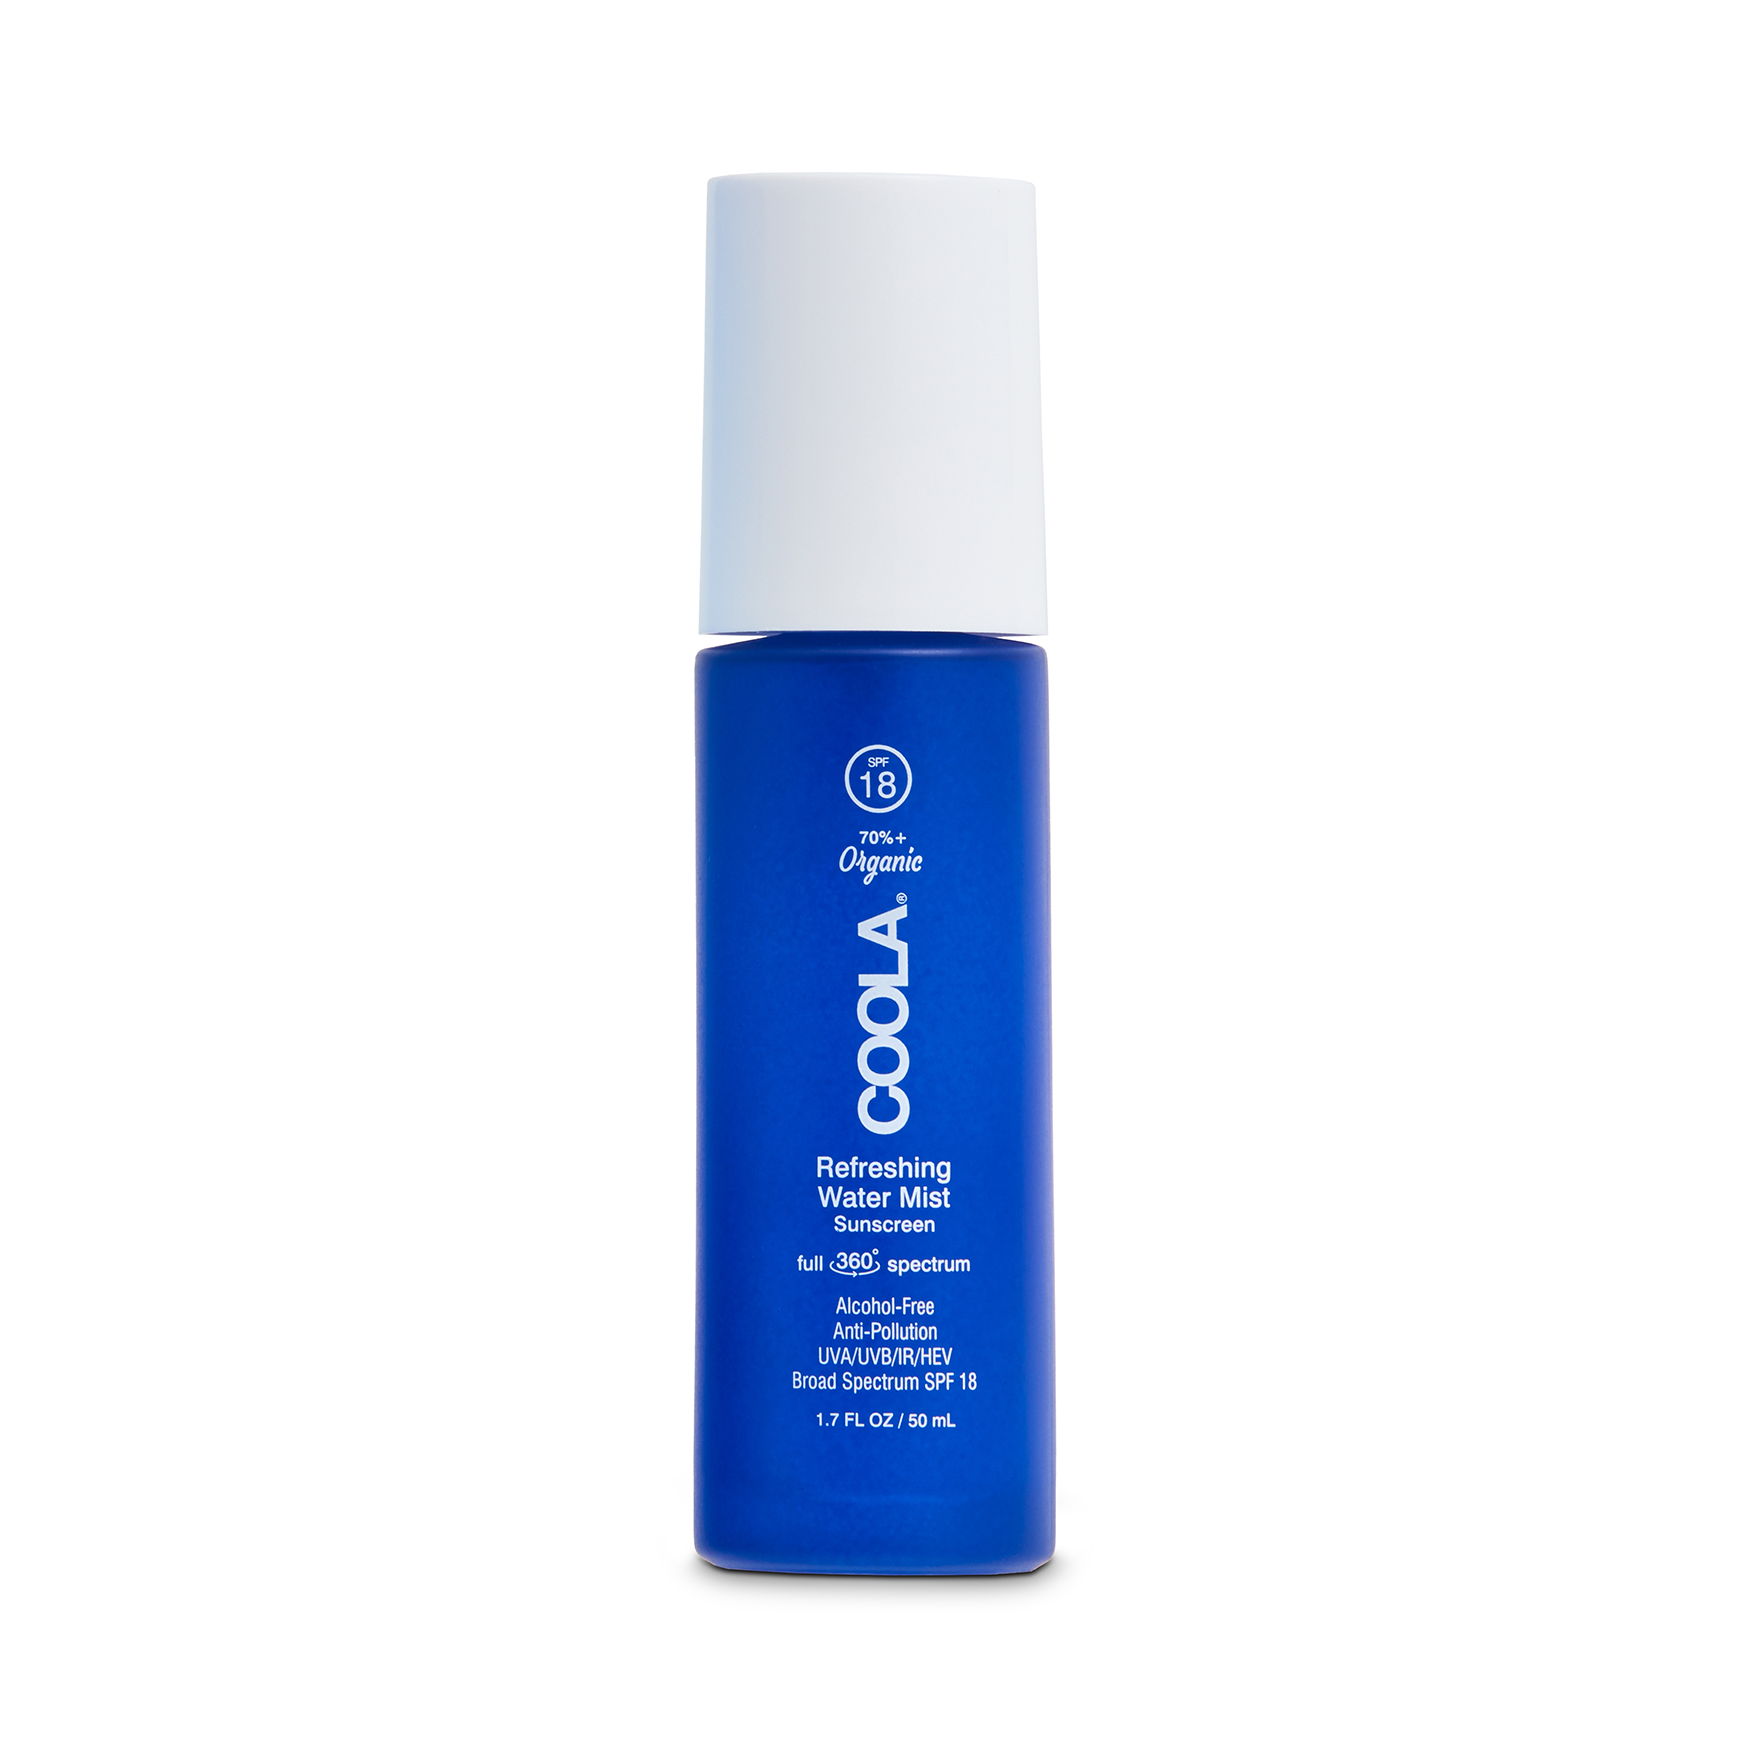 Full Spectrum 360° Refreshing Water Mist Organic Face Sunscreen SPF18, , large